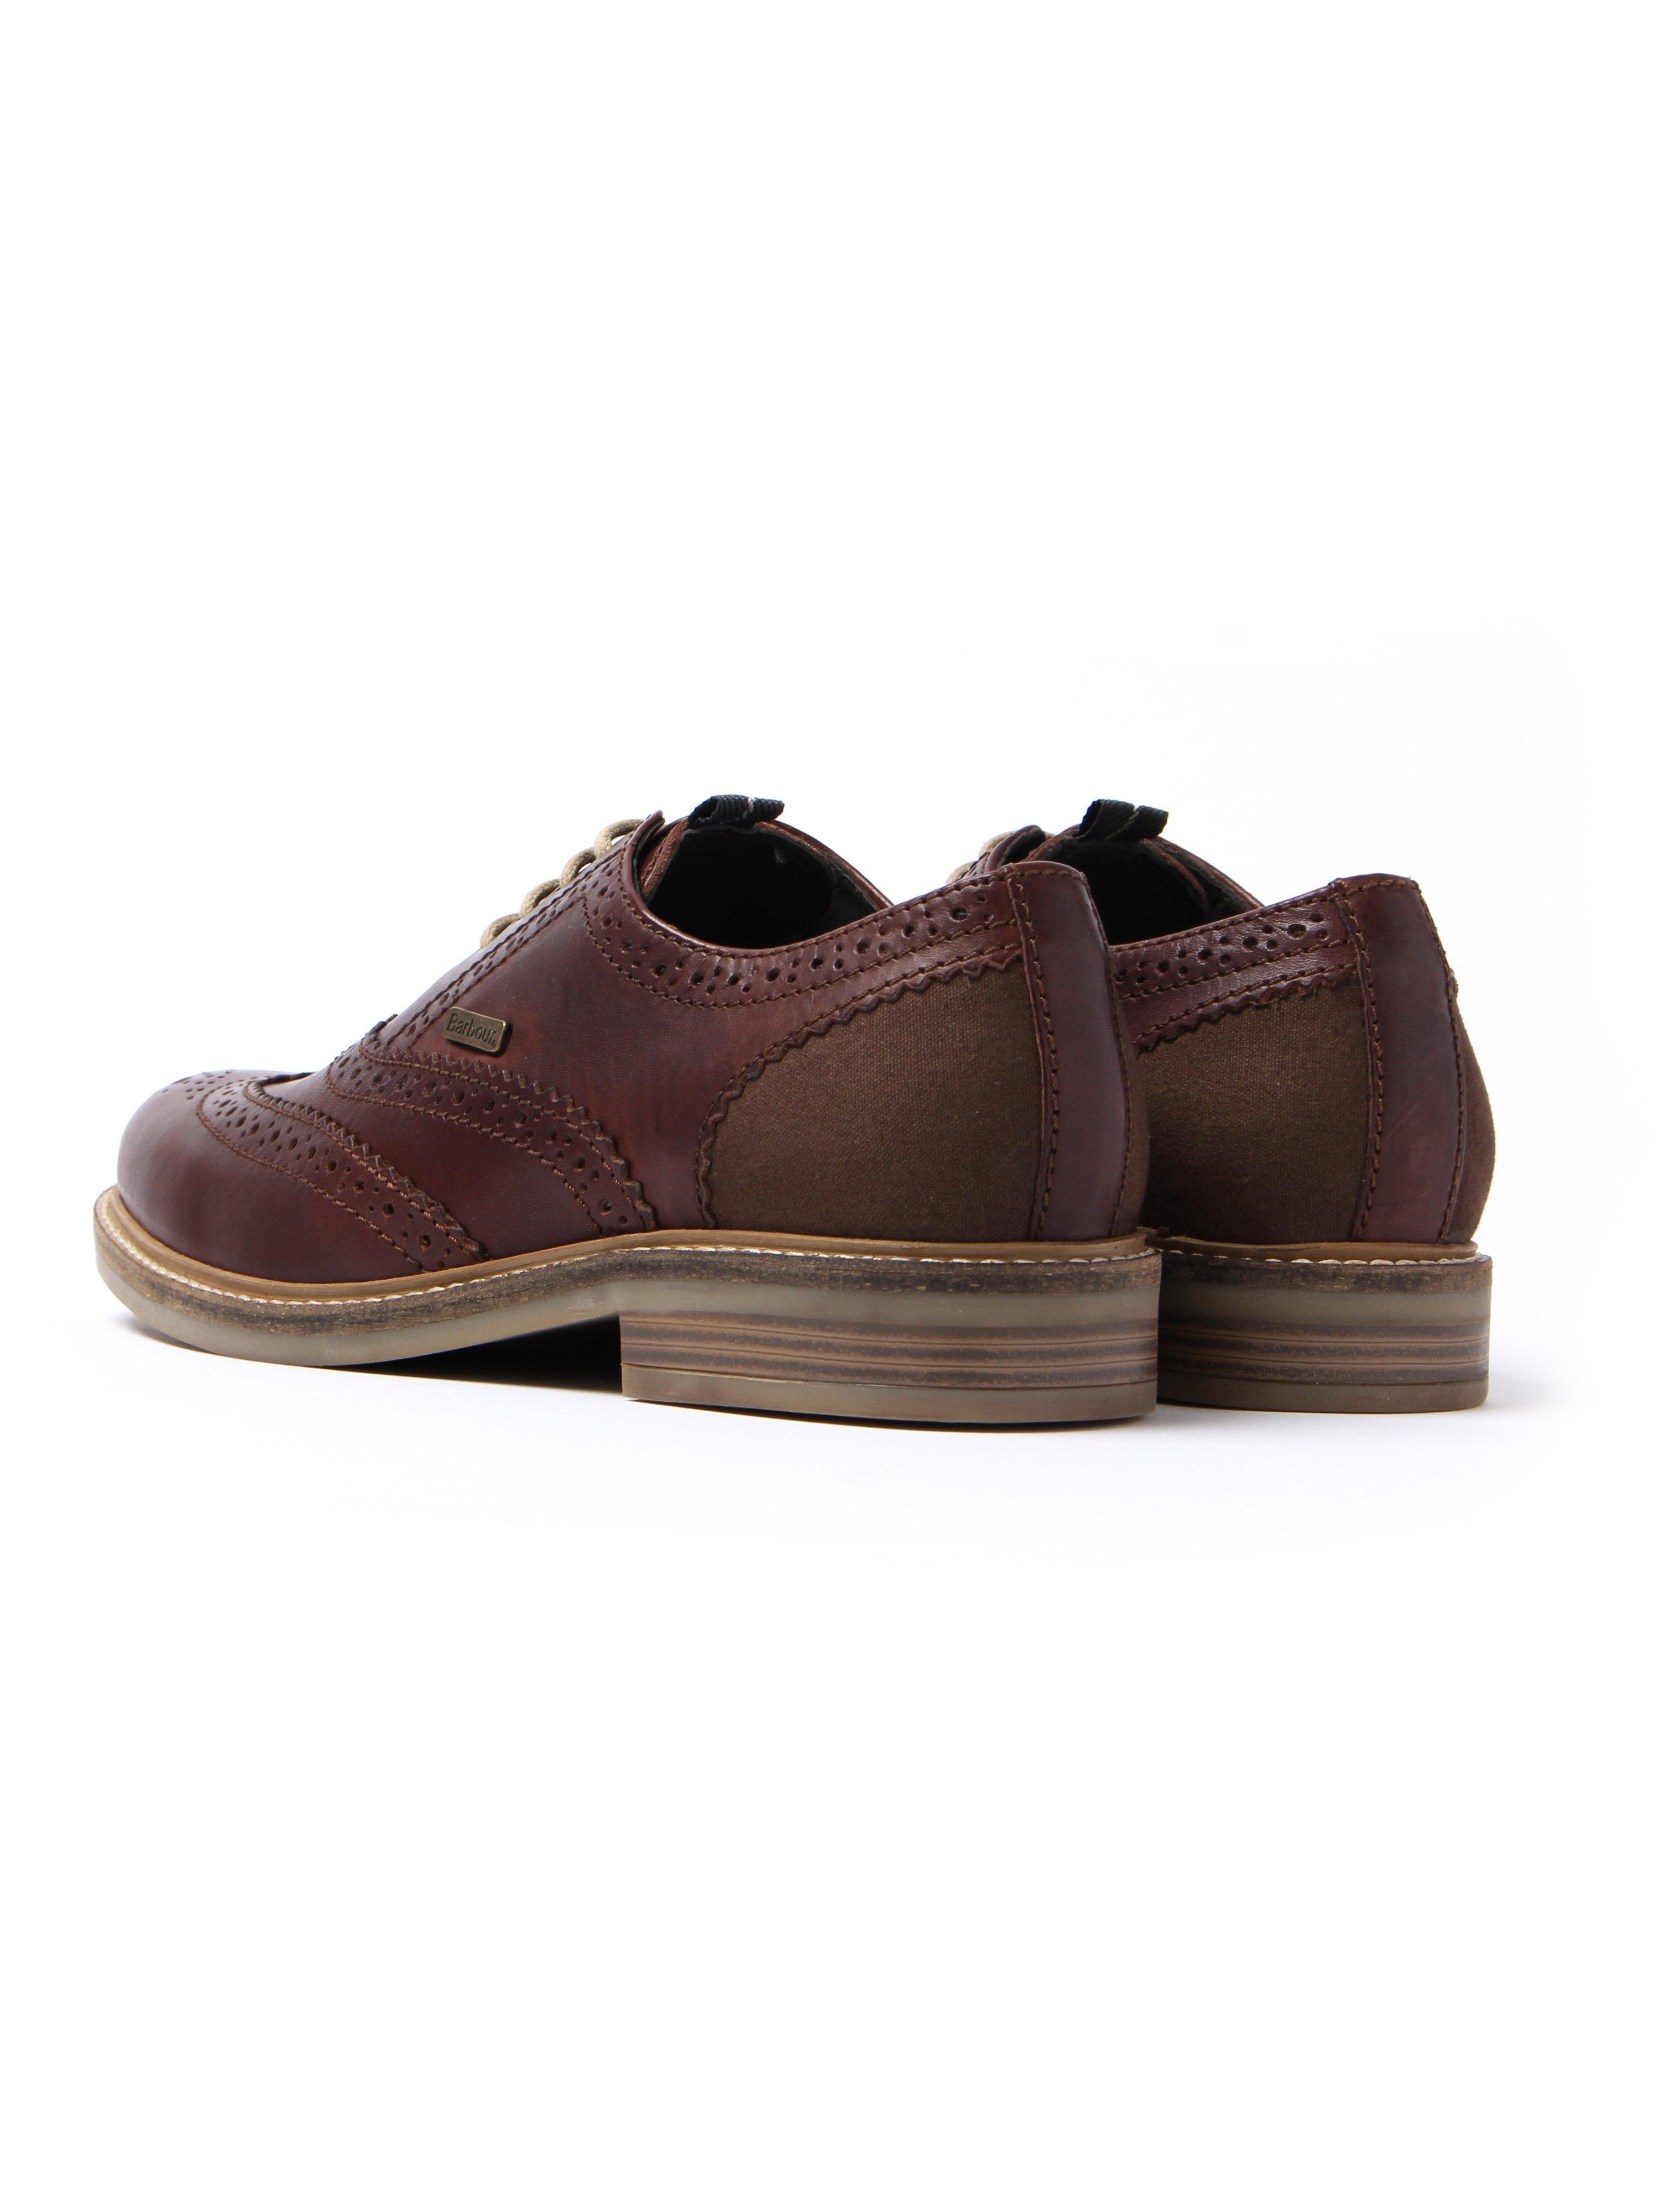 Barbour Men's Redcar Leather Oxford Brogue - Dark Brown